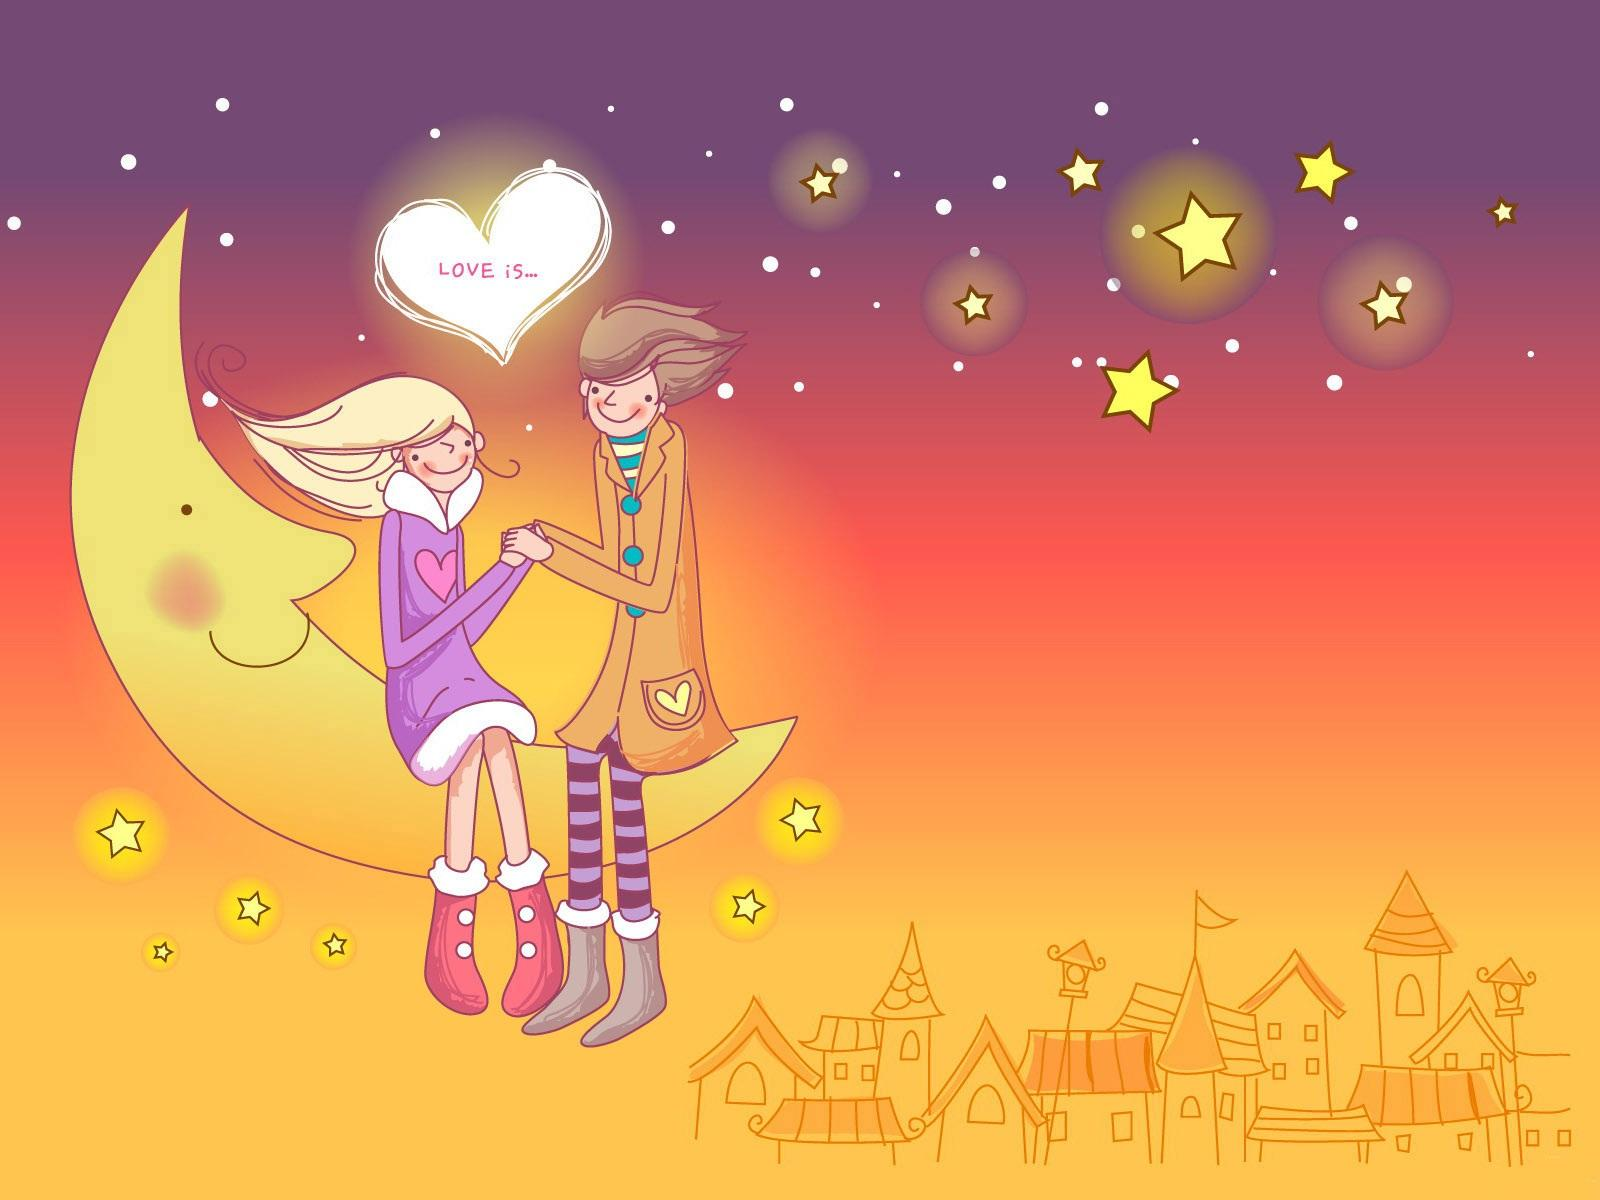 Tarjetas y postales de Amor: Wallpapers de amor